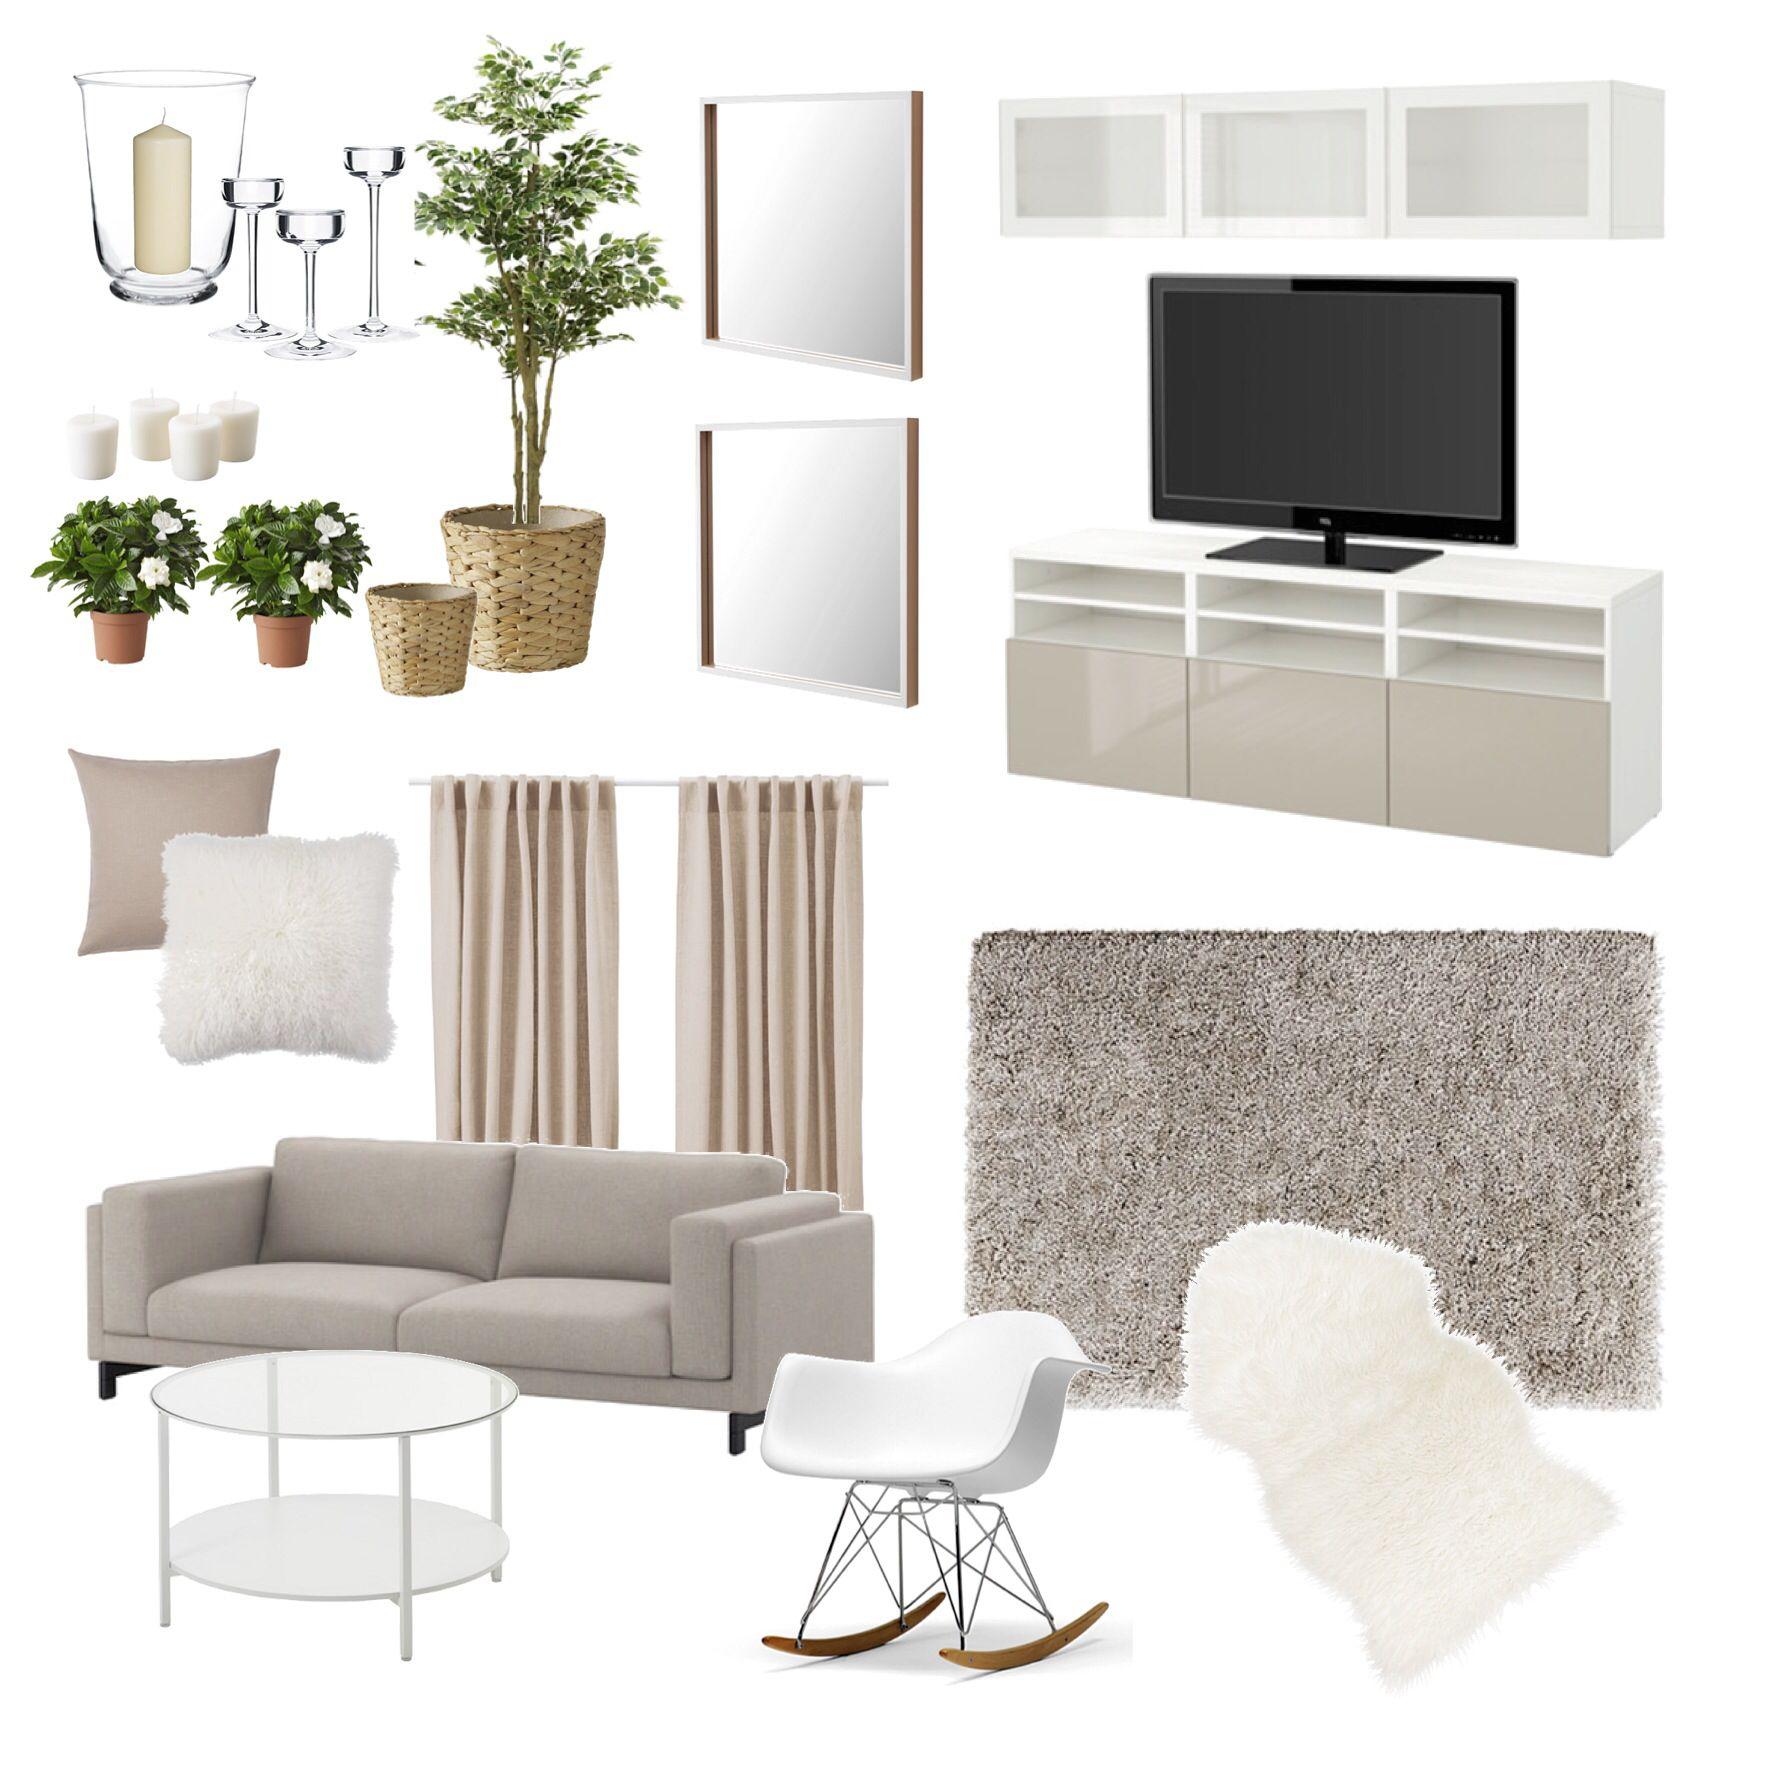 Ikea home. Neutral color scheme, simple elegant beautiful ...